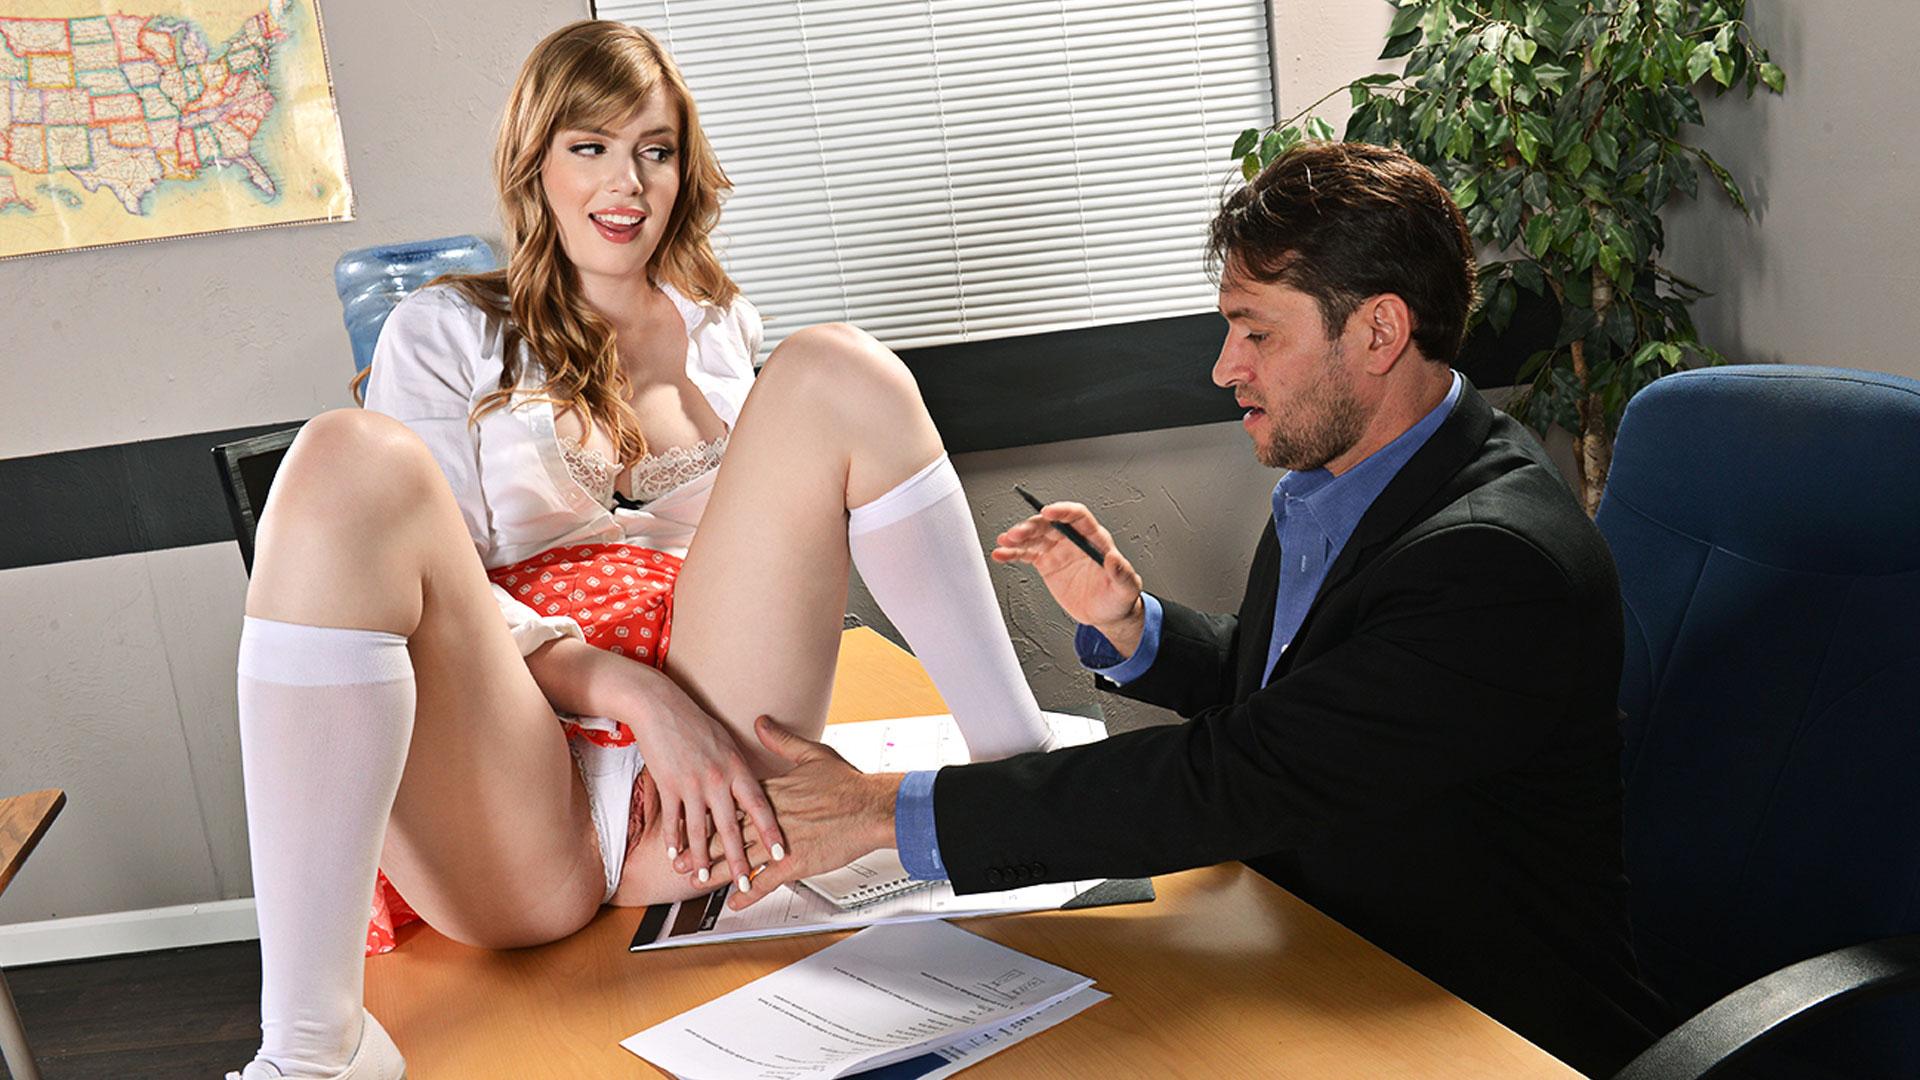 Rather valuable Naughty teacher fantasy porn